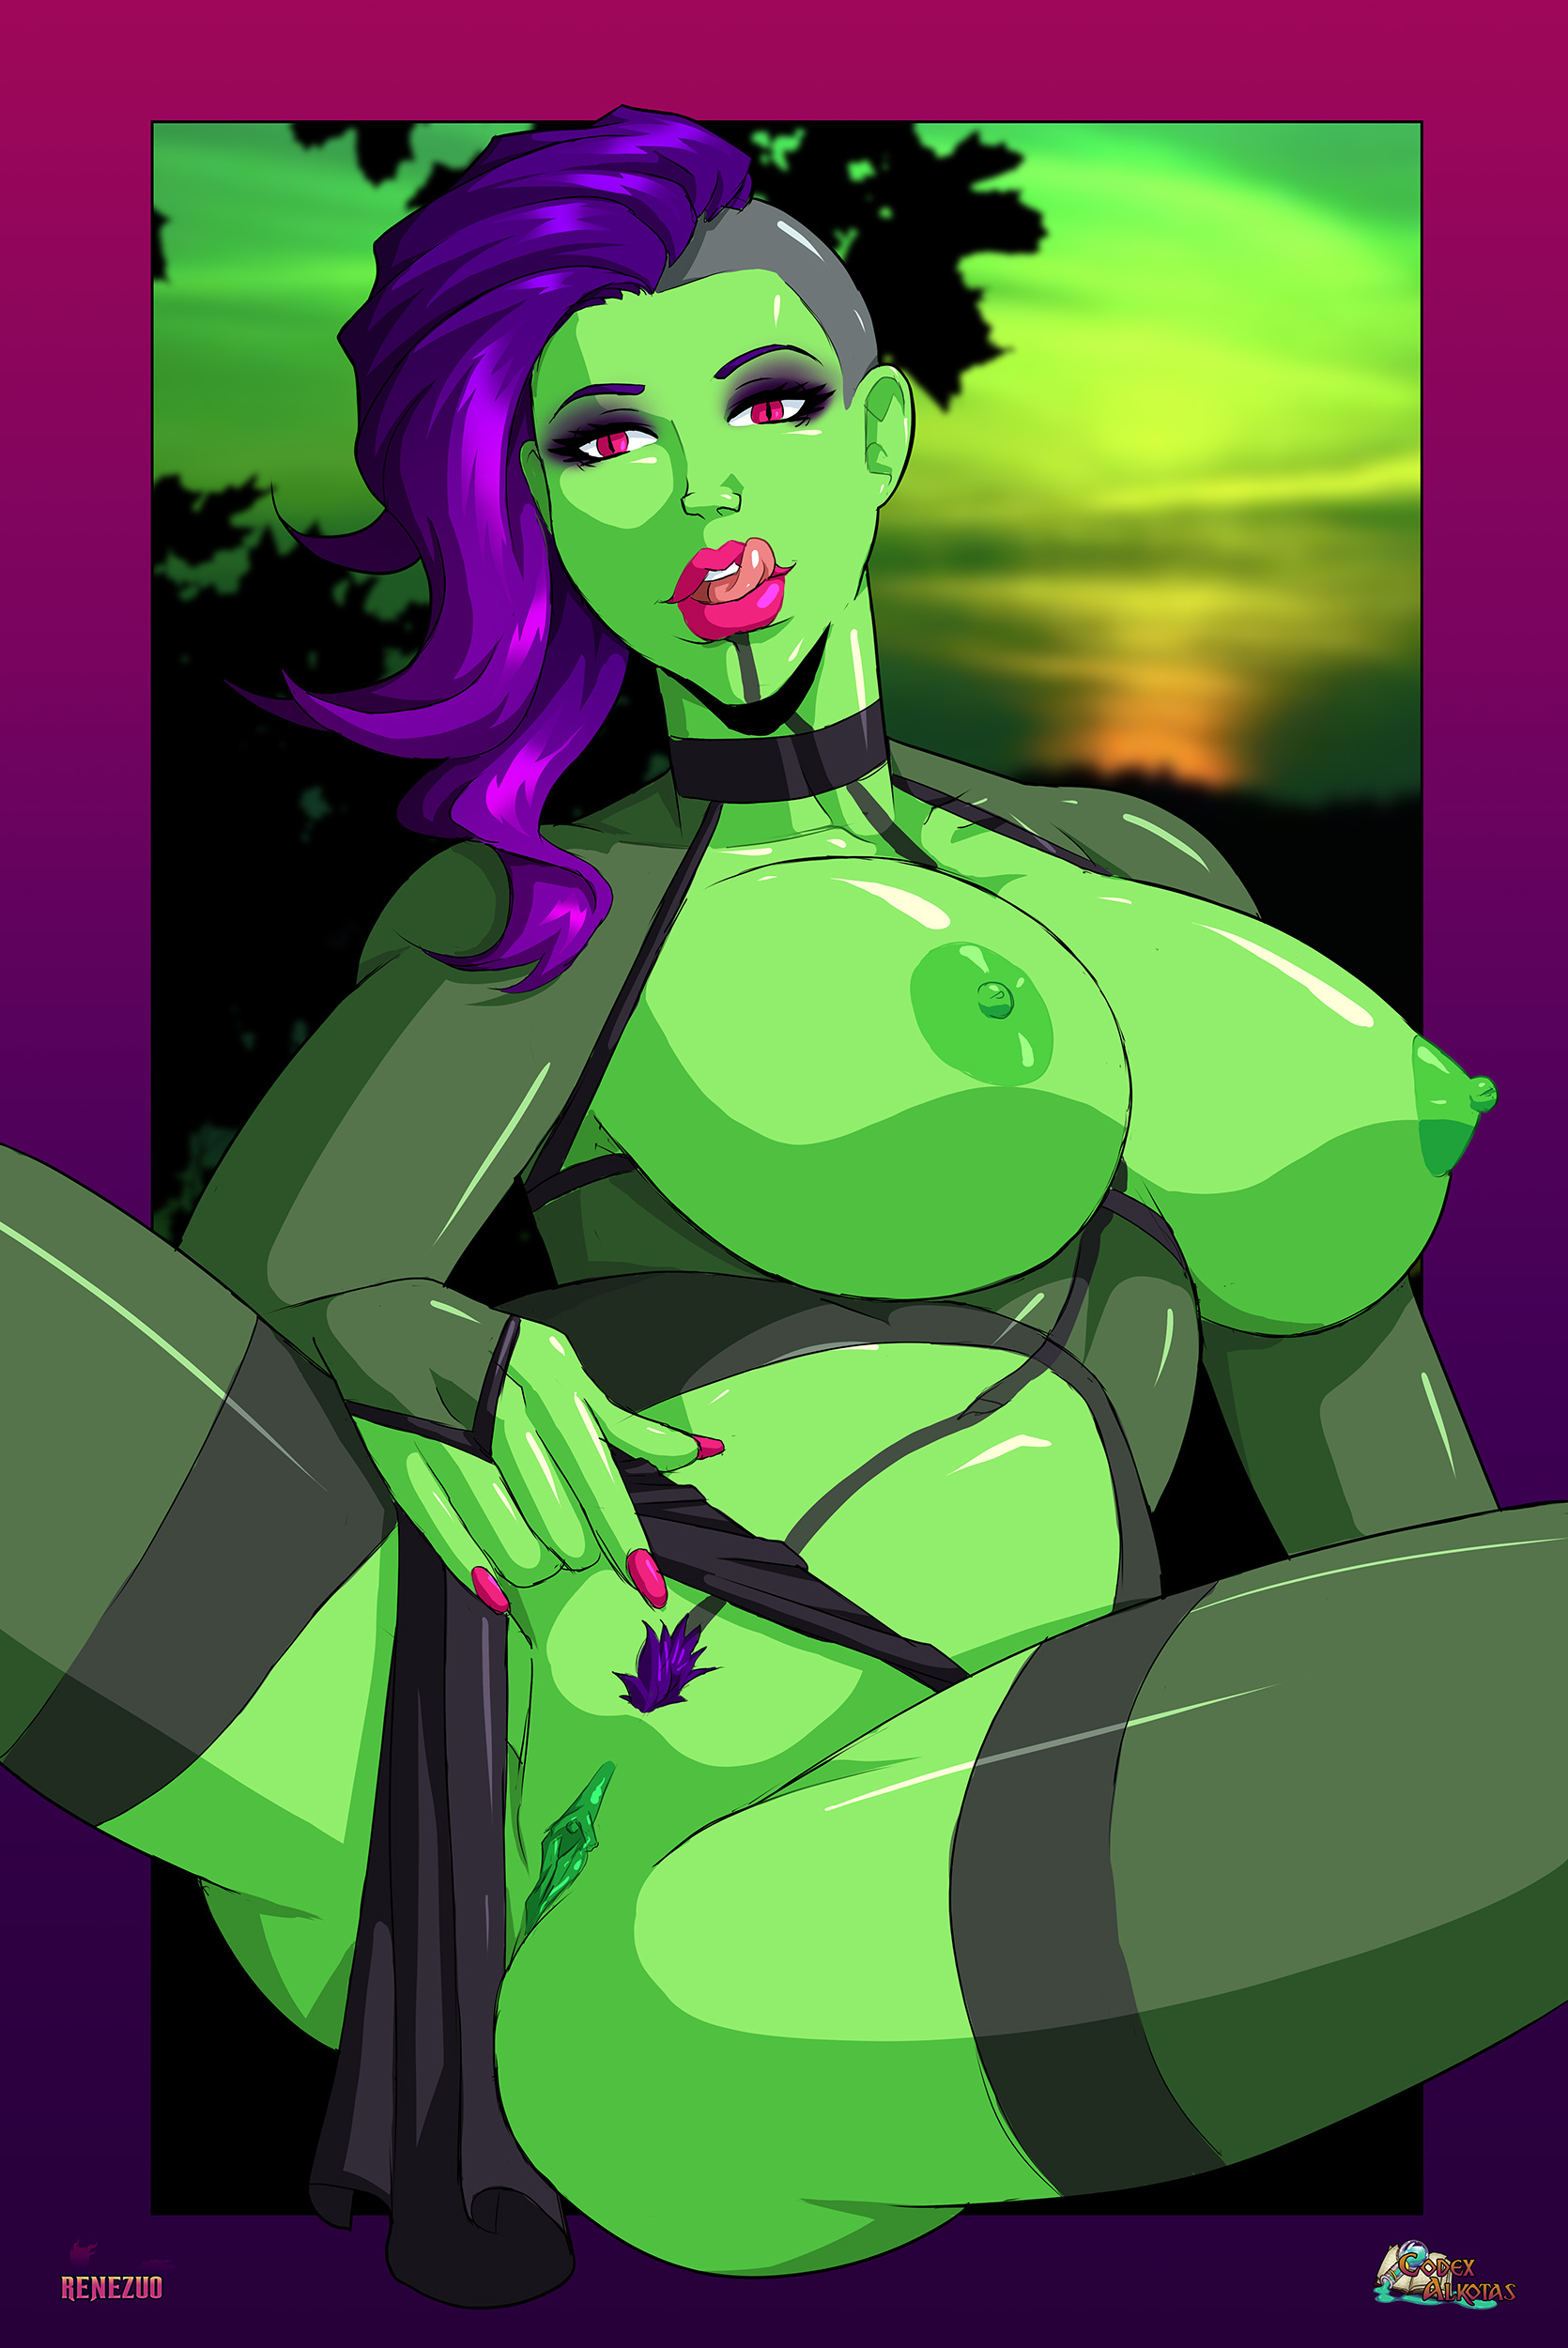 Peonny of the Verdant Lust